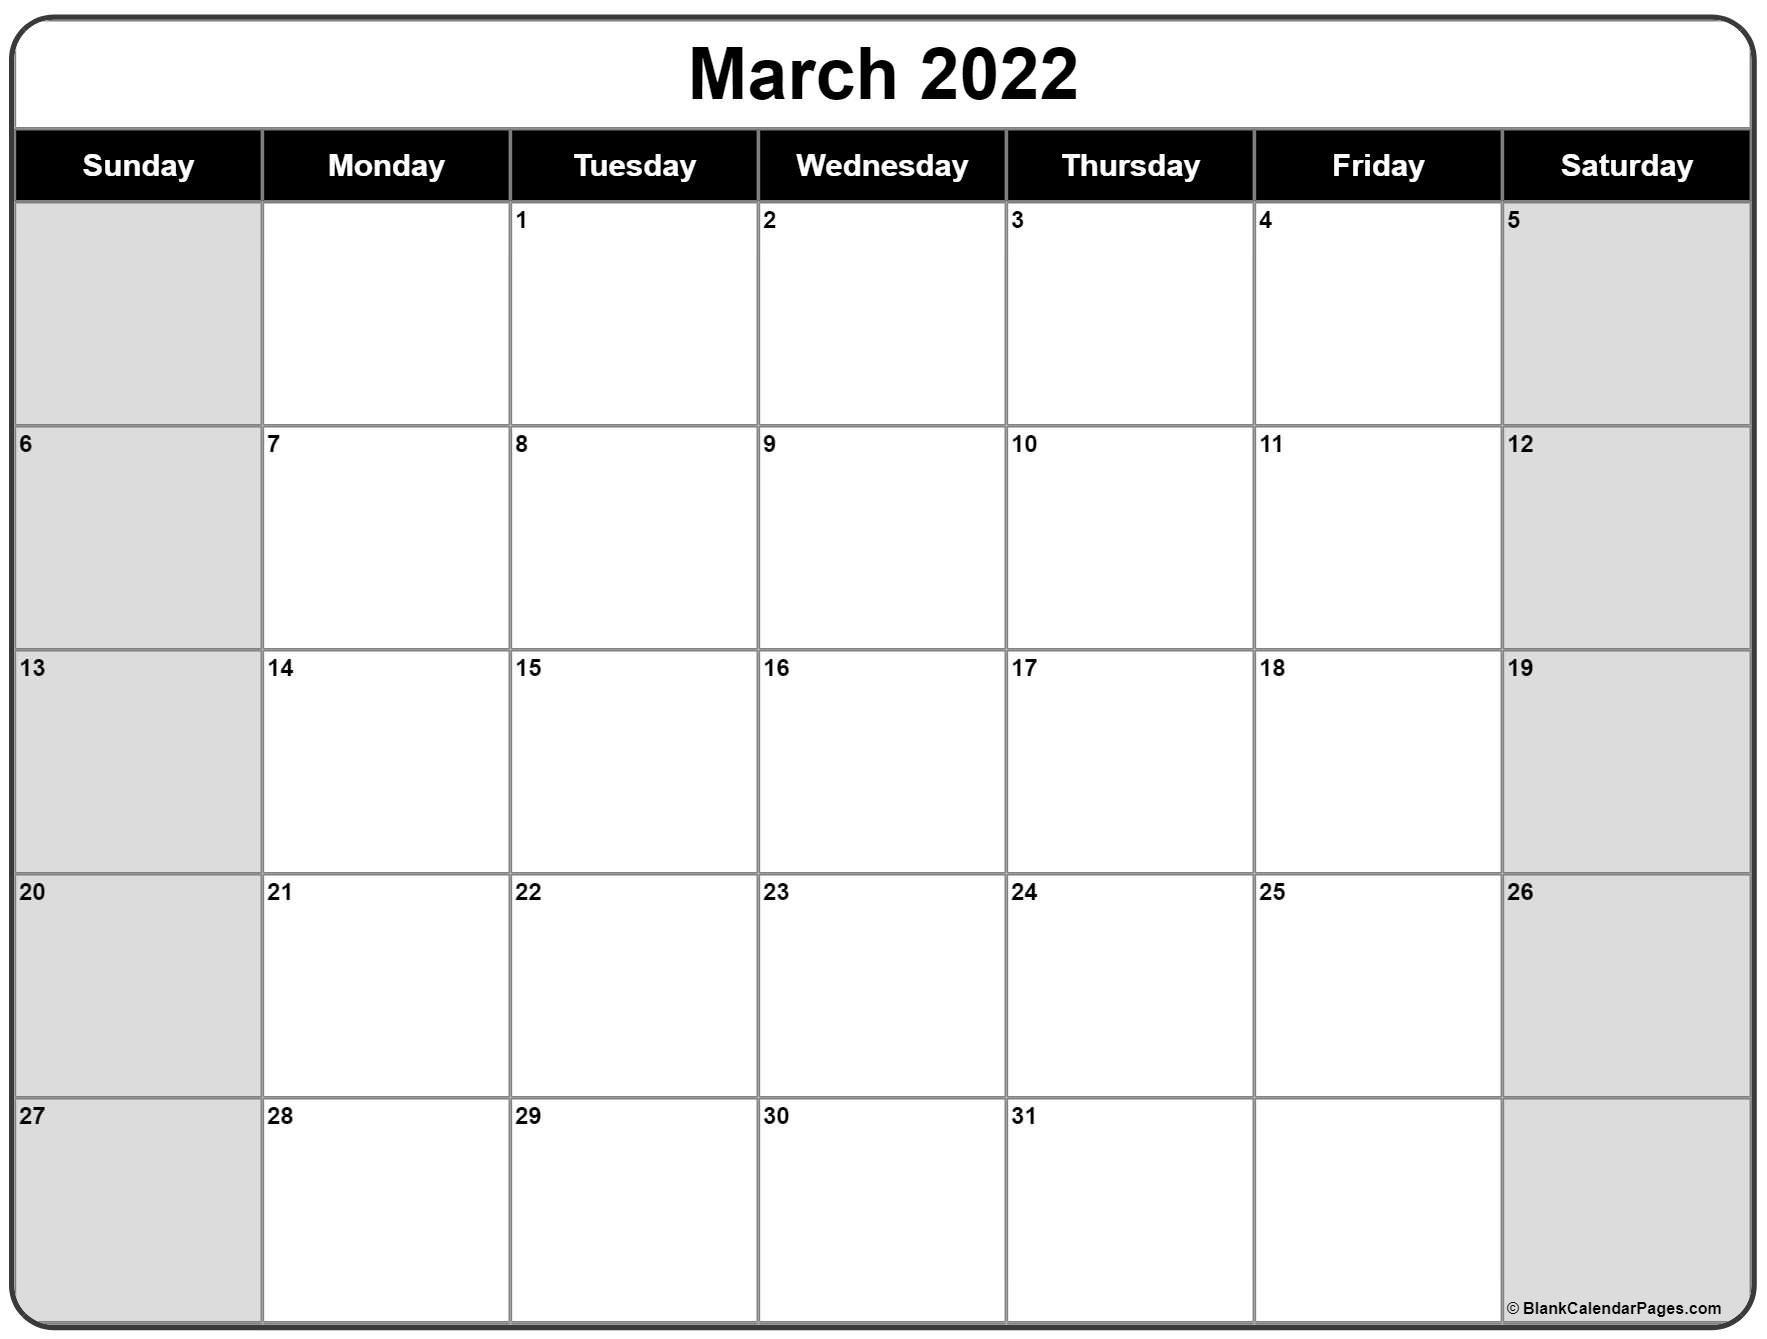 March 2022 Calendar | Free Printable Calendar Templates inside Planner 2022 Printable Goal Image